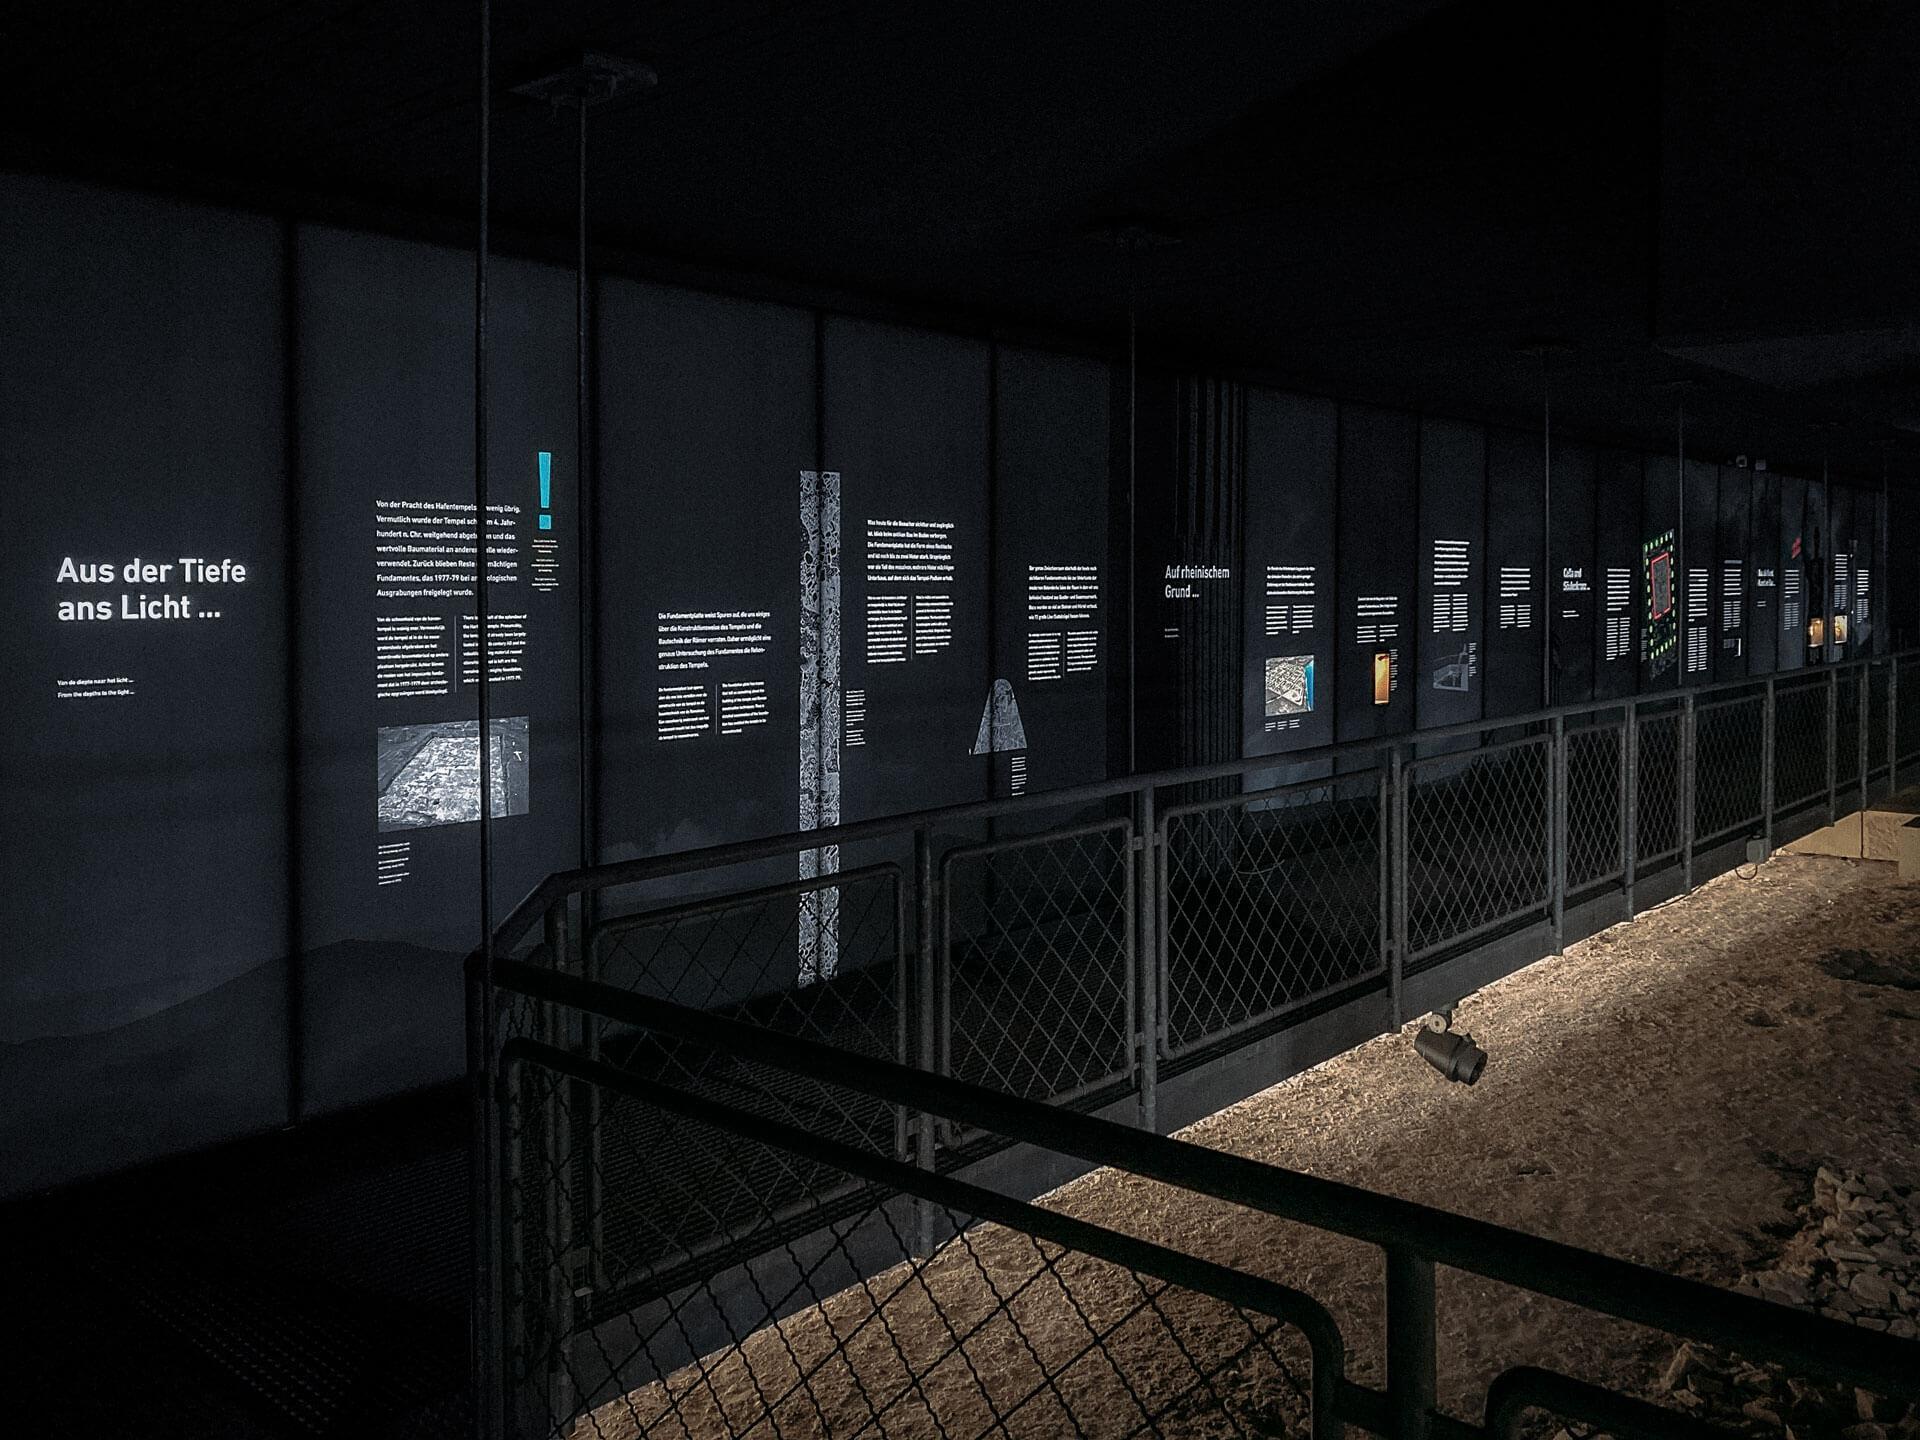 APX Ausstellung Hafentempel 01